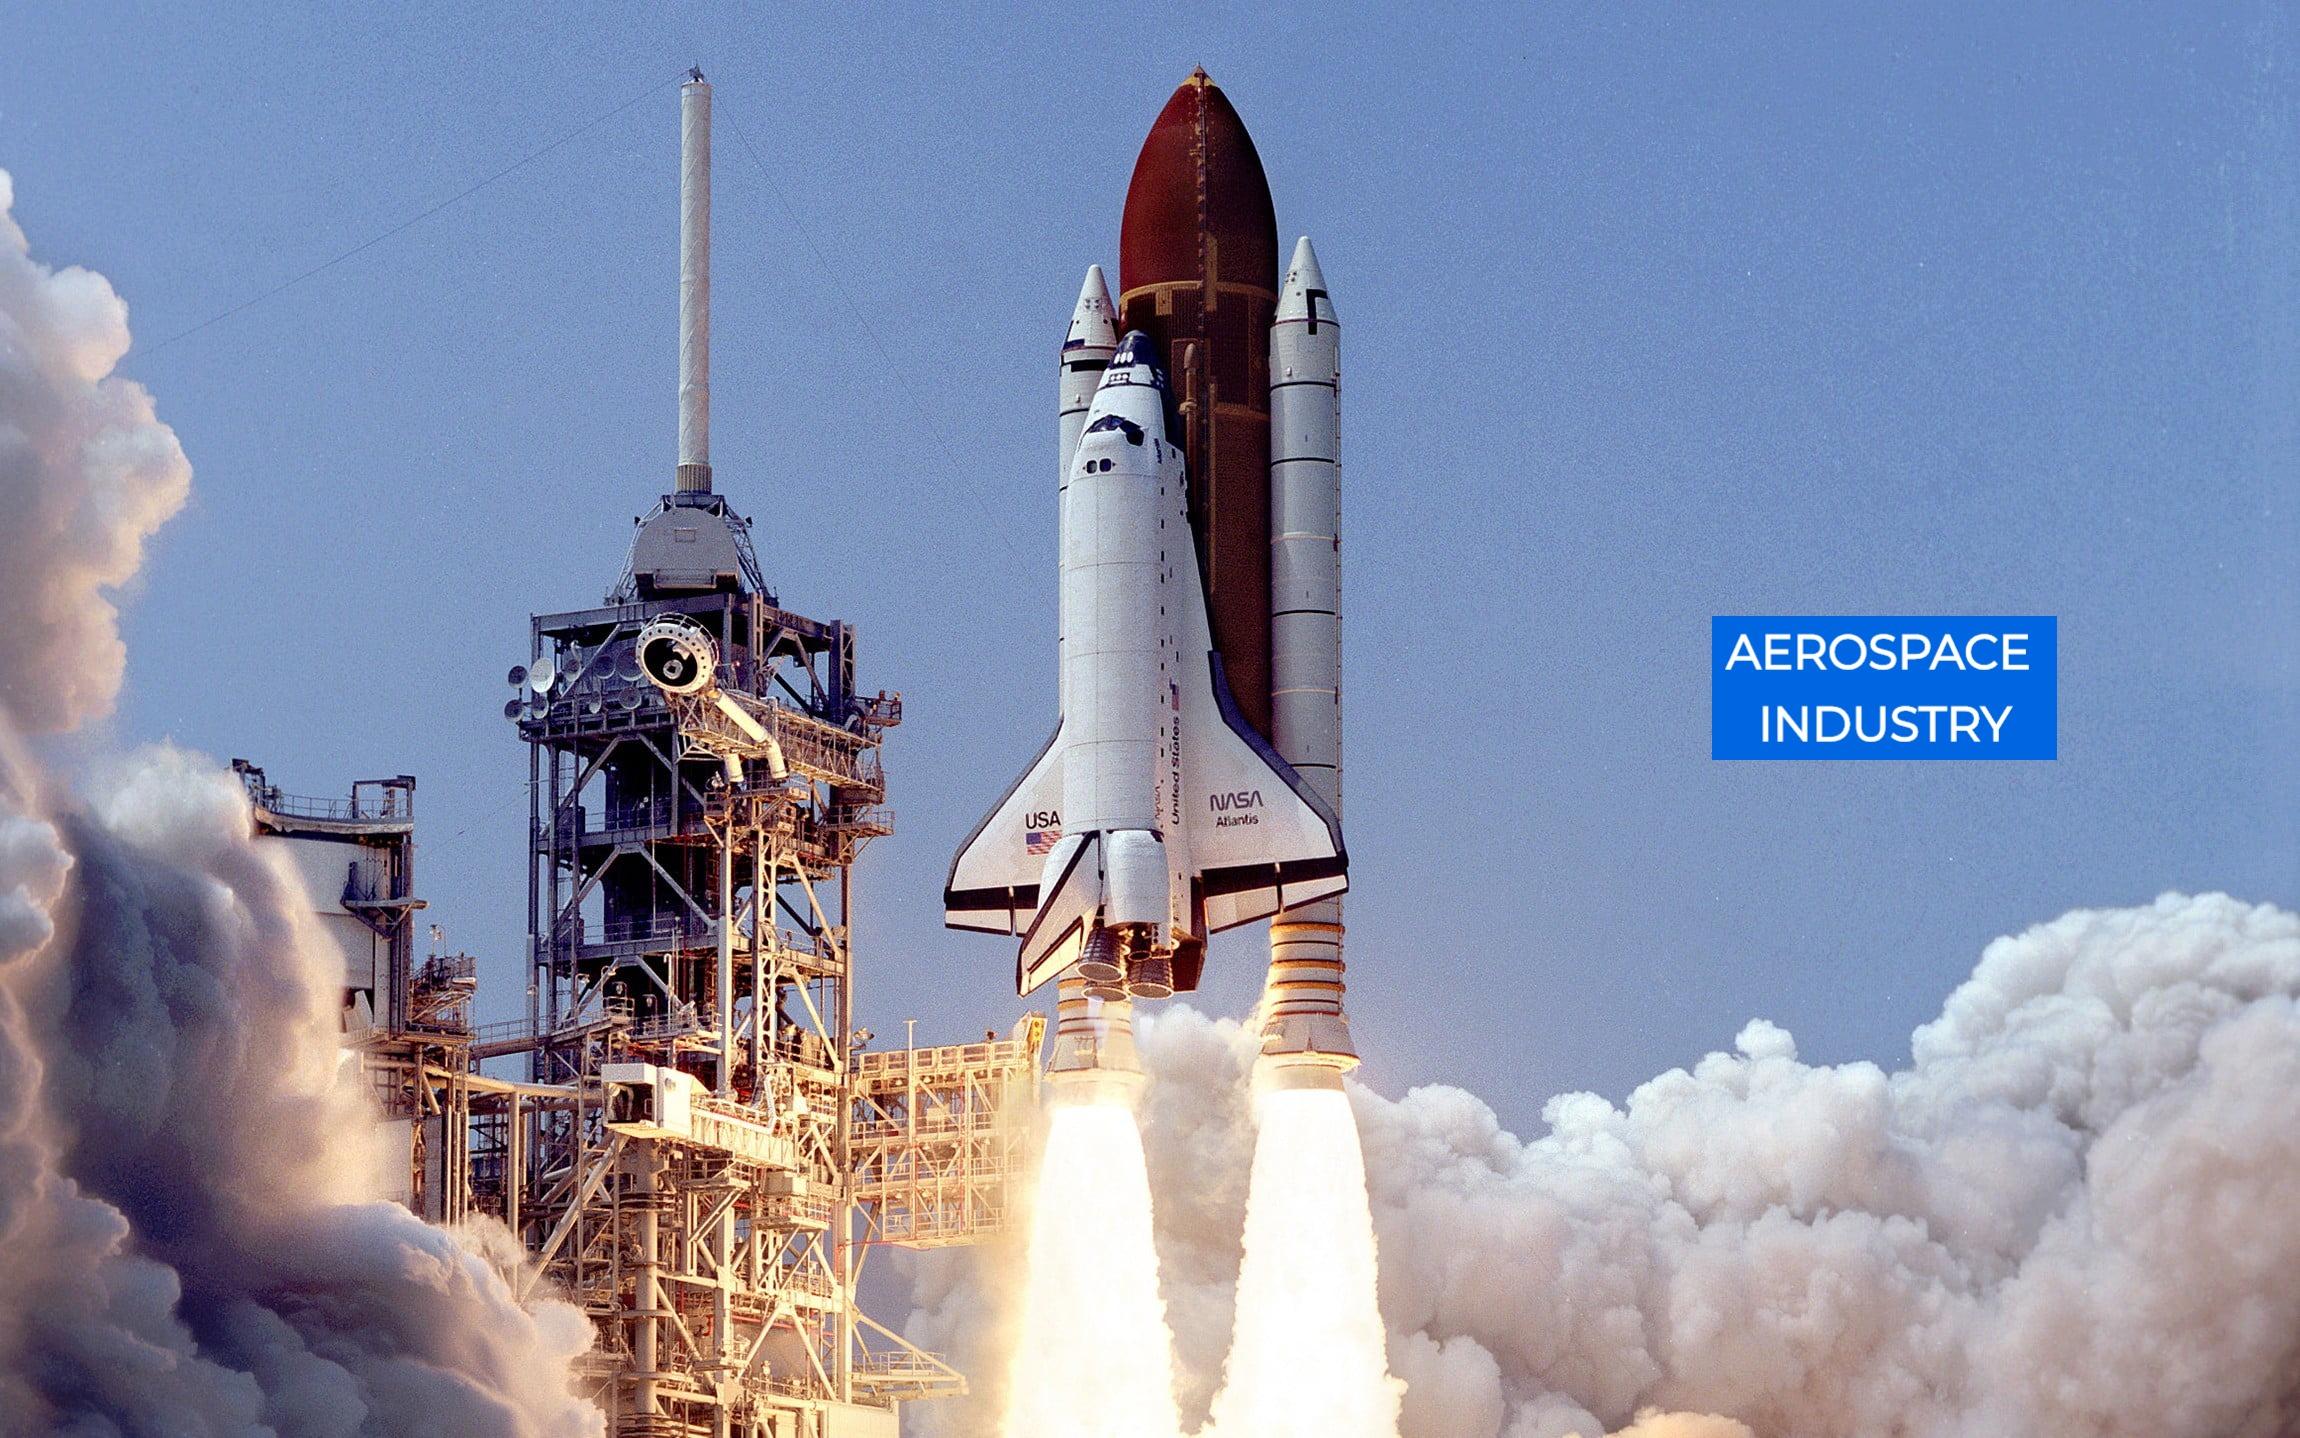 Aerospace Industry - Aeronautical Industry - Aviation Industry - Cryogenics Industry - Space Shuttle